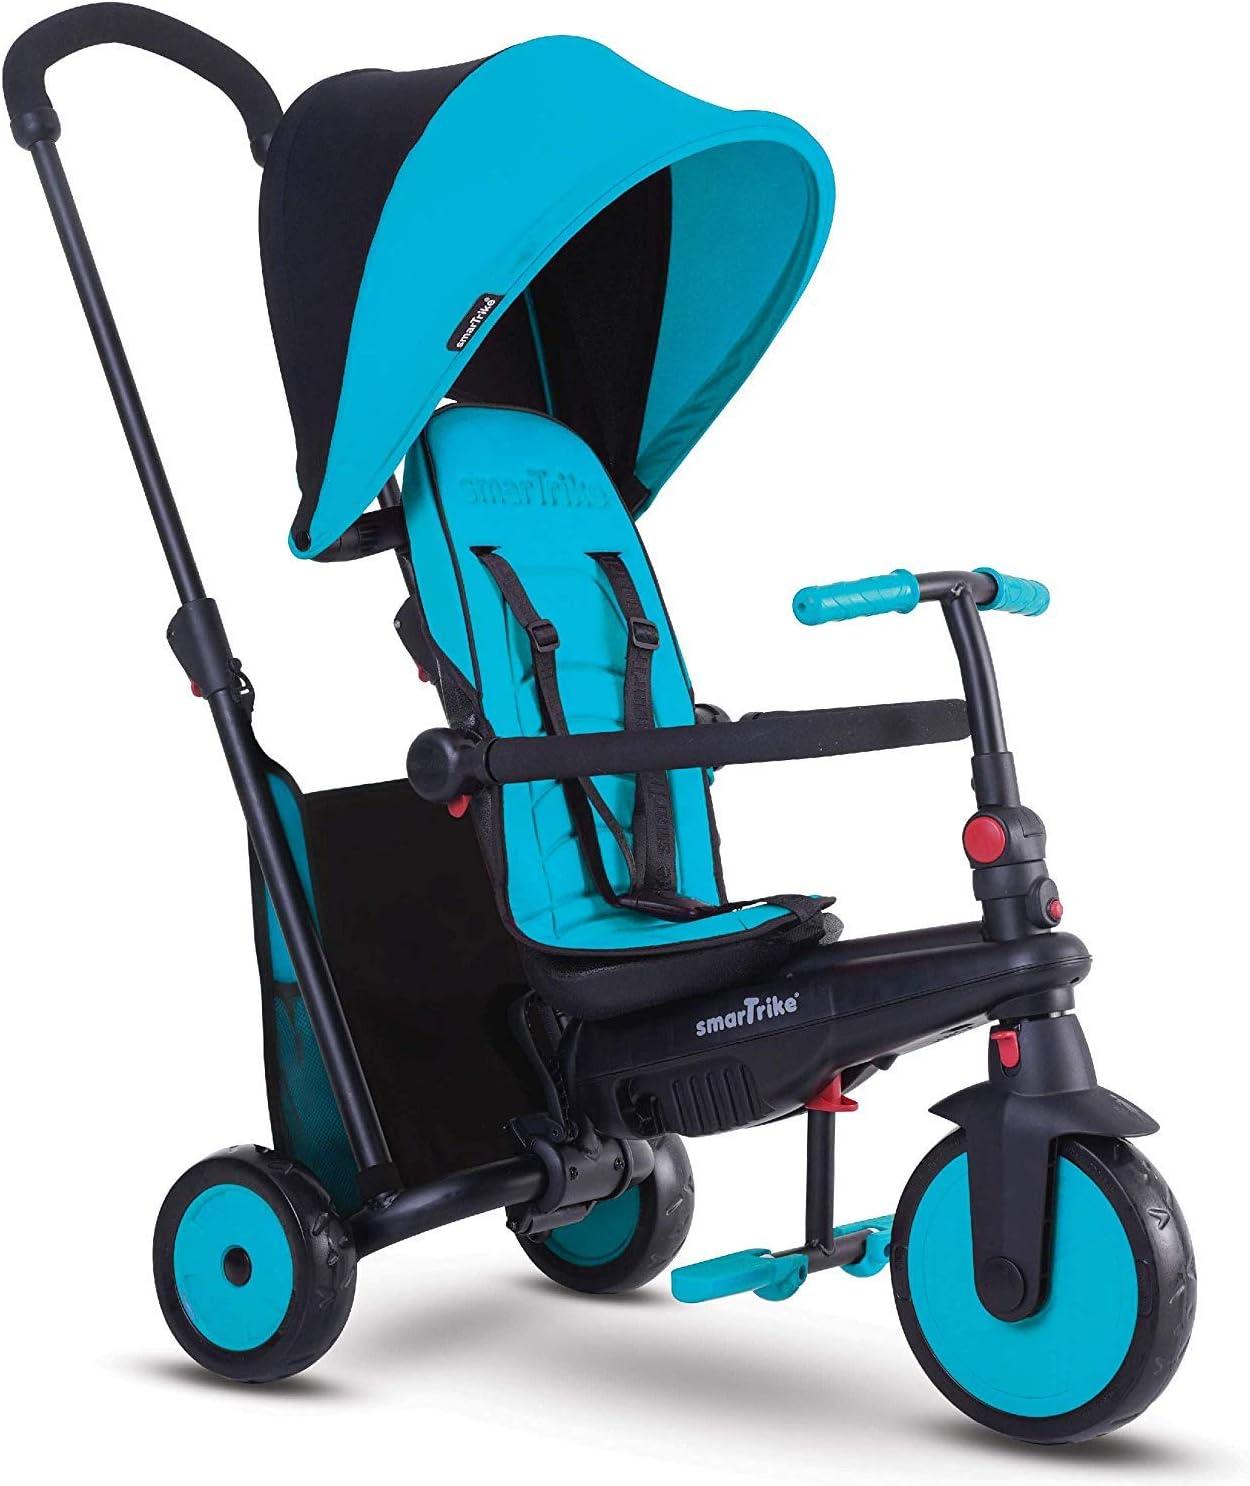 SMARTRIKE smarTfold 300 Triciclo Plegable para bebé, Color Azul (5021800)